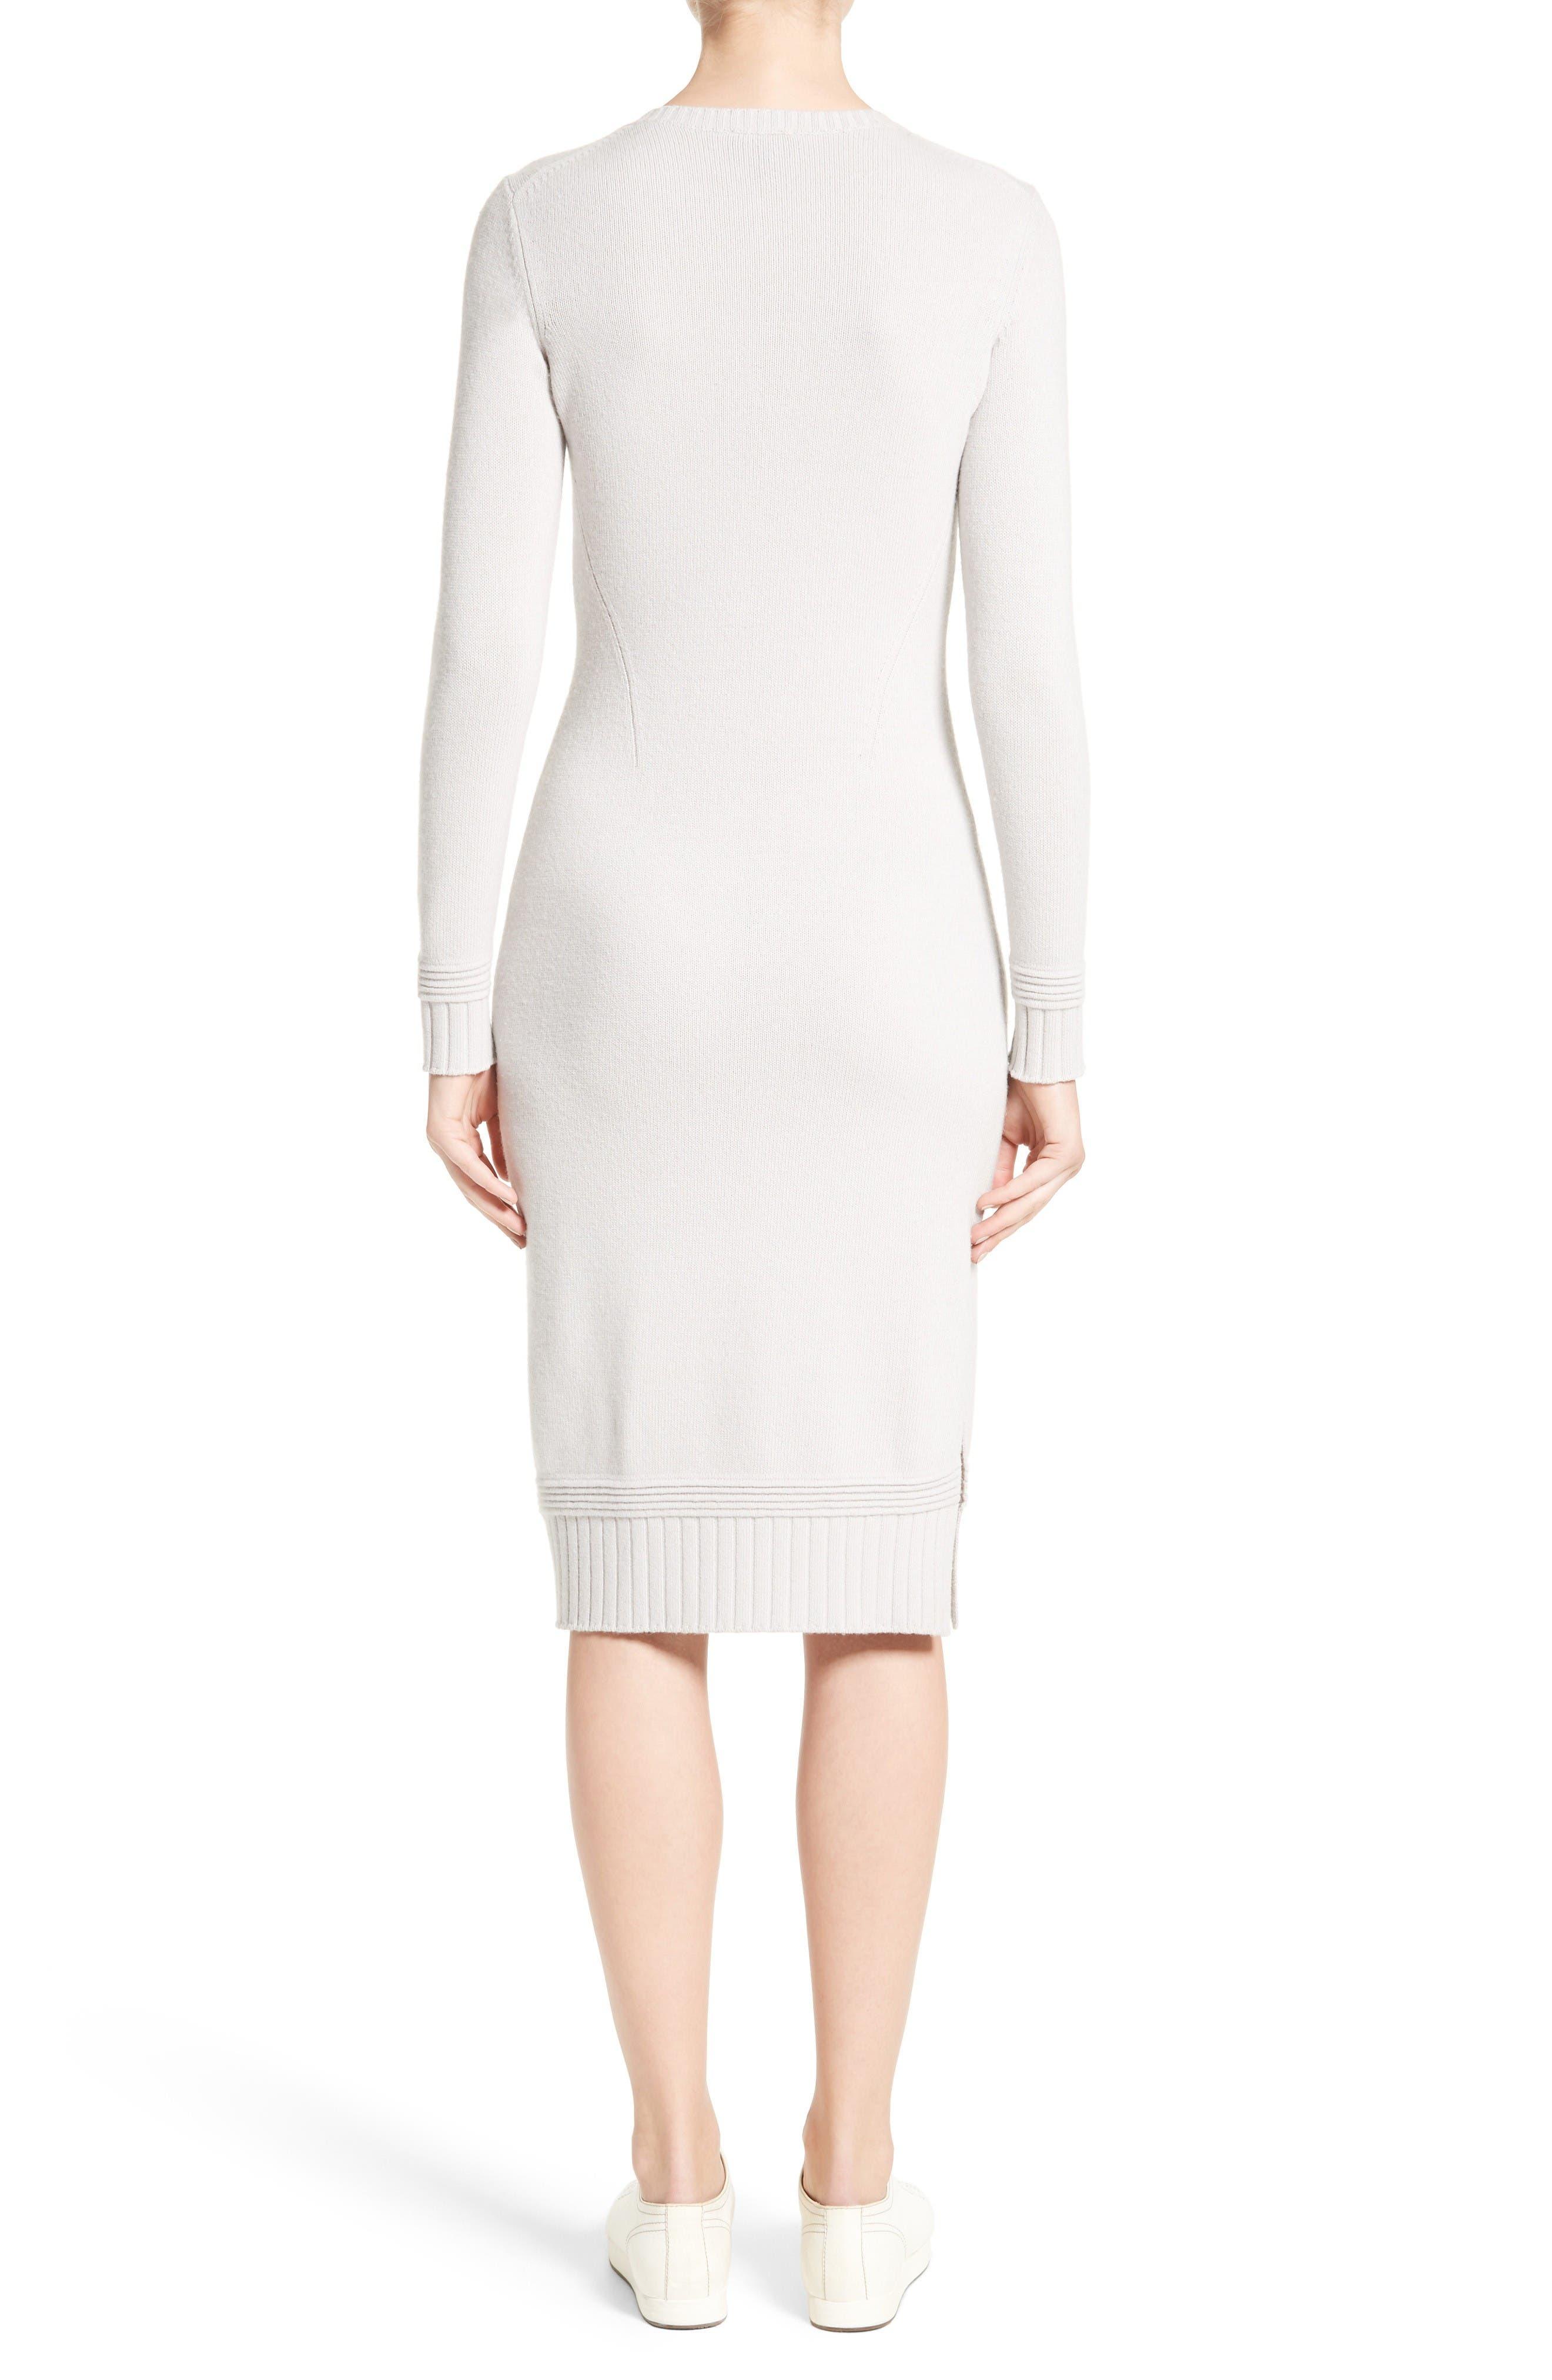 Armani Jeans Knit Sweater Dress,                             Alternate thumbnail 2, color,                             Light Grey